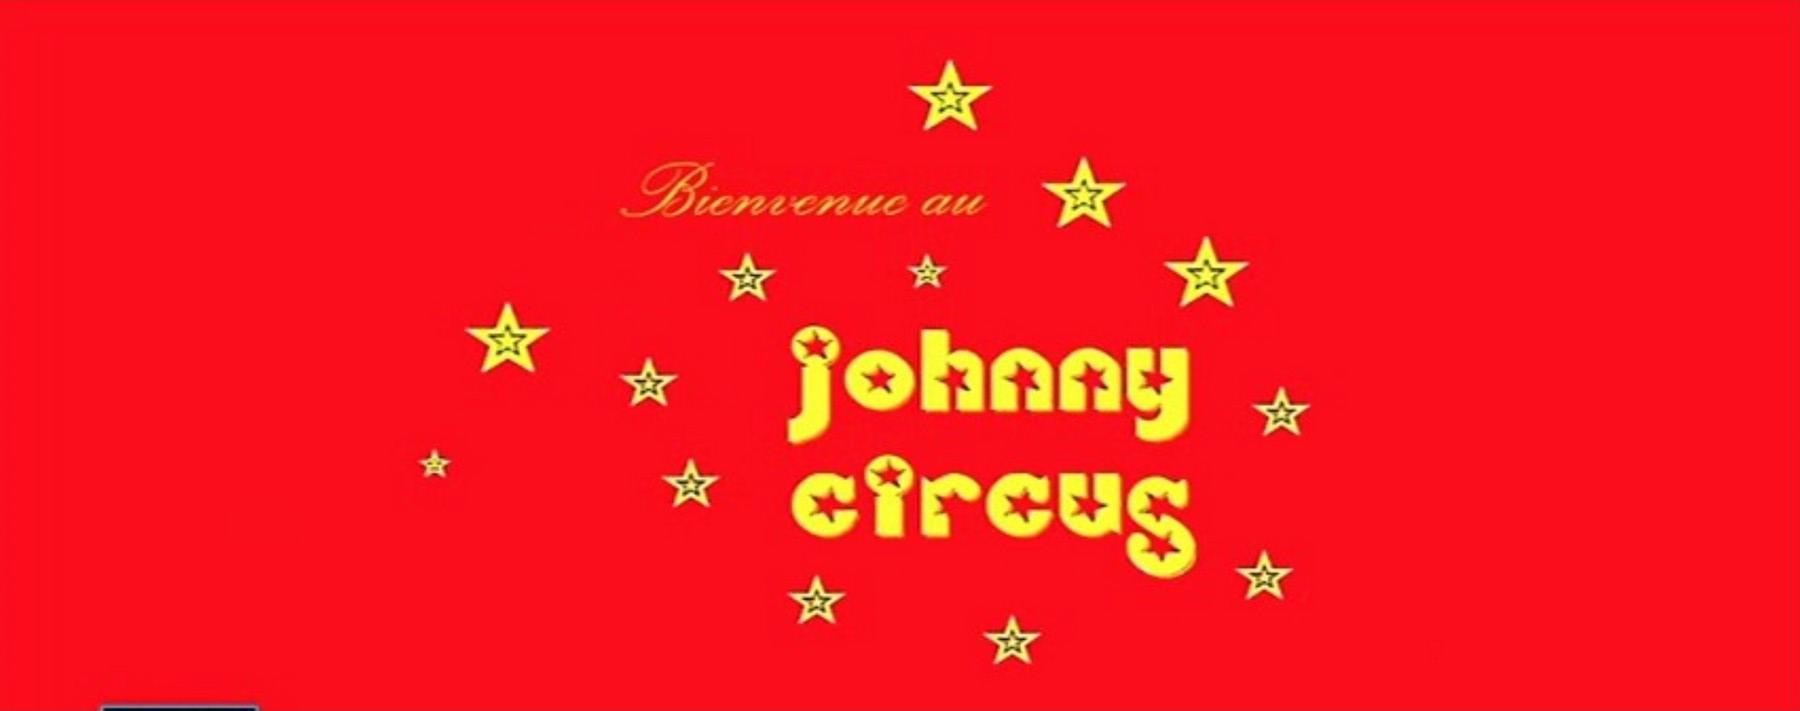 HONDA JAPAUTO CB 950 SS DE JOHNNY HALLYDAY ( 1972 ) Vlcsna17